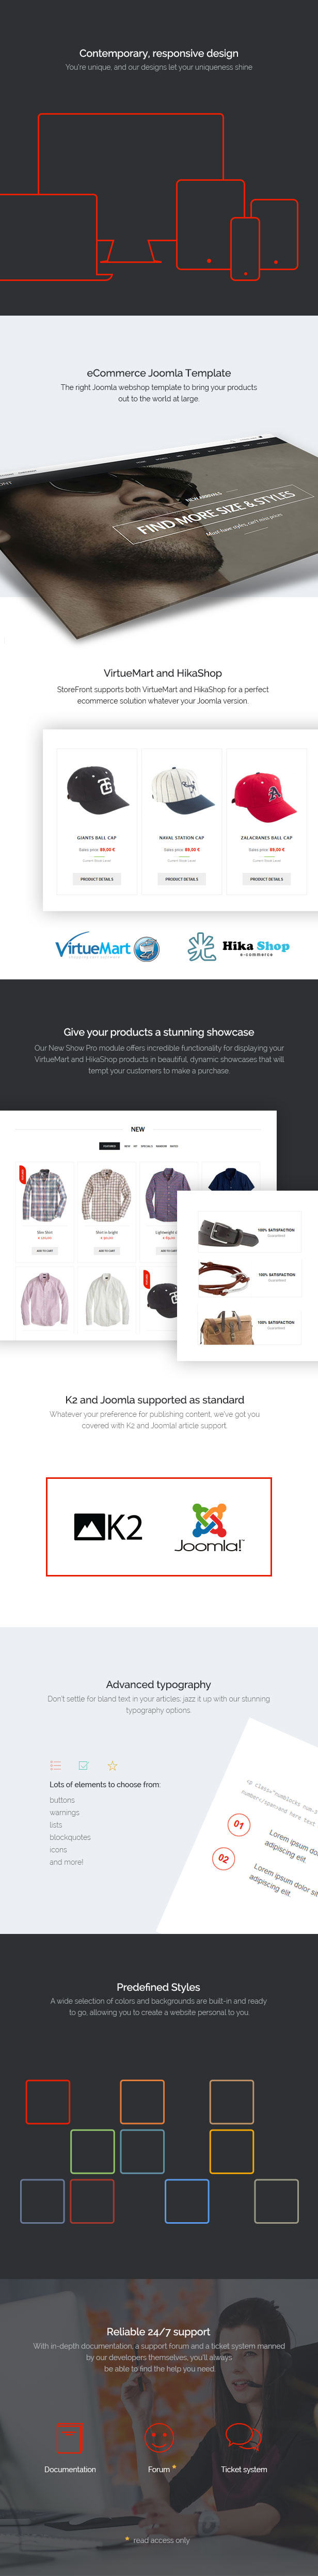 Storefront - eCommerce Joomla Template from GavickPro